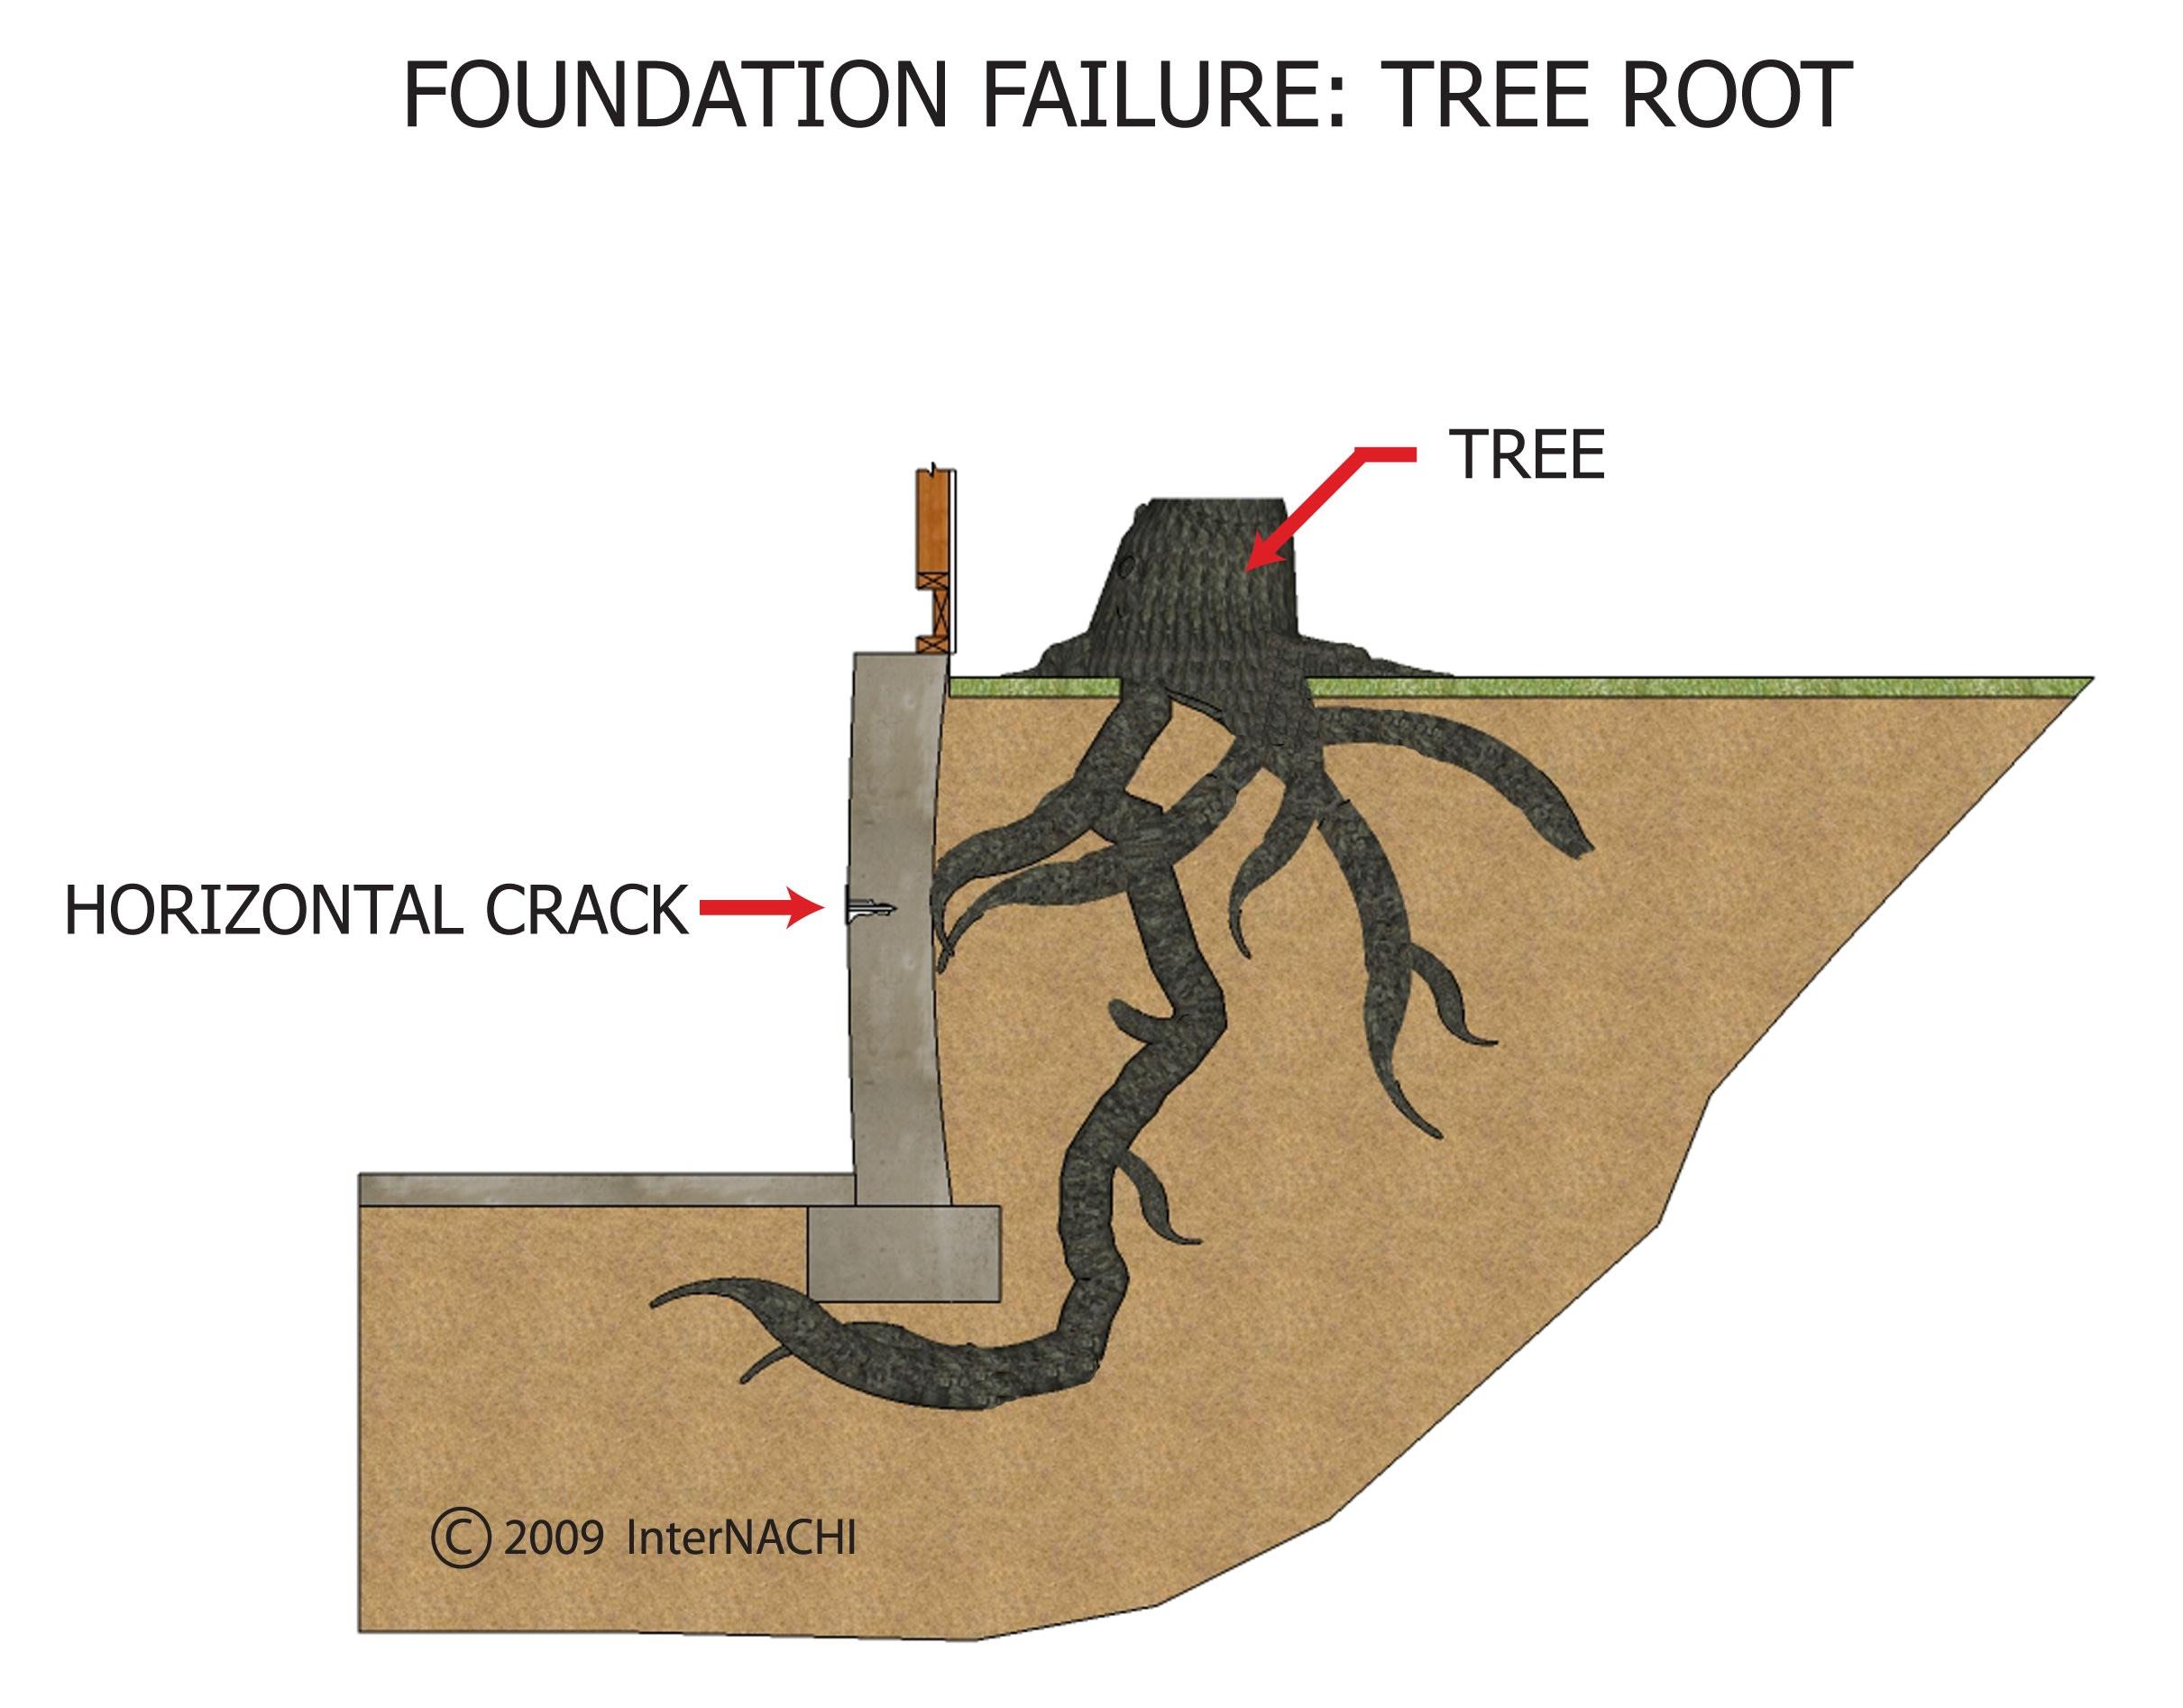 Tree root.